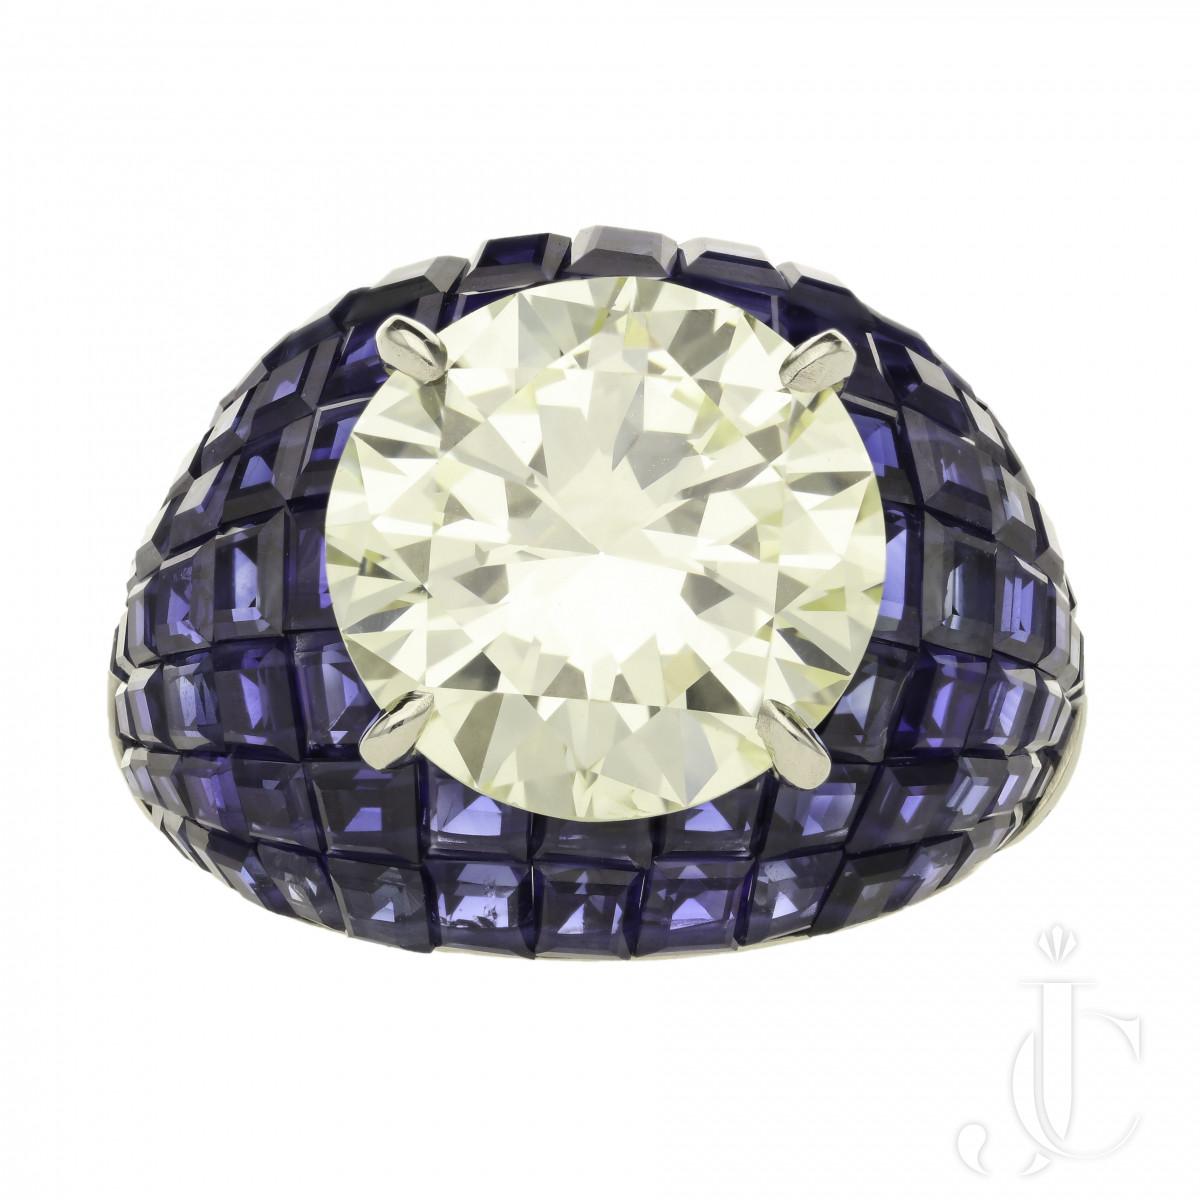 Oscar Heyman - 8.24ct Diamond & invisibly-set sapphire ring